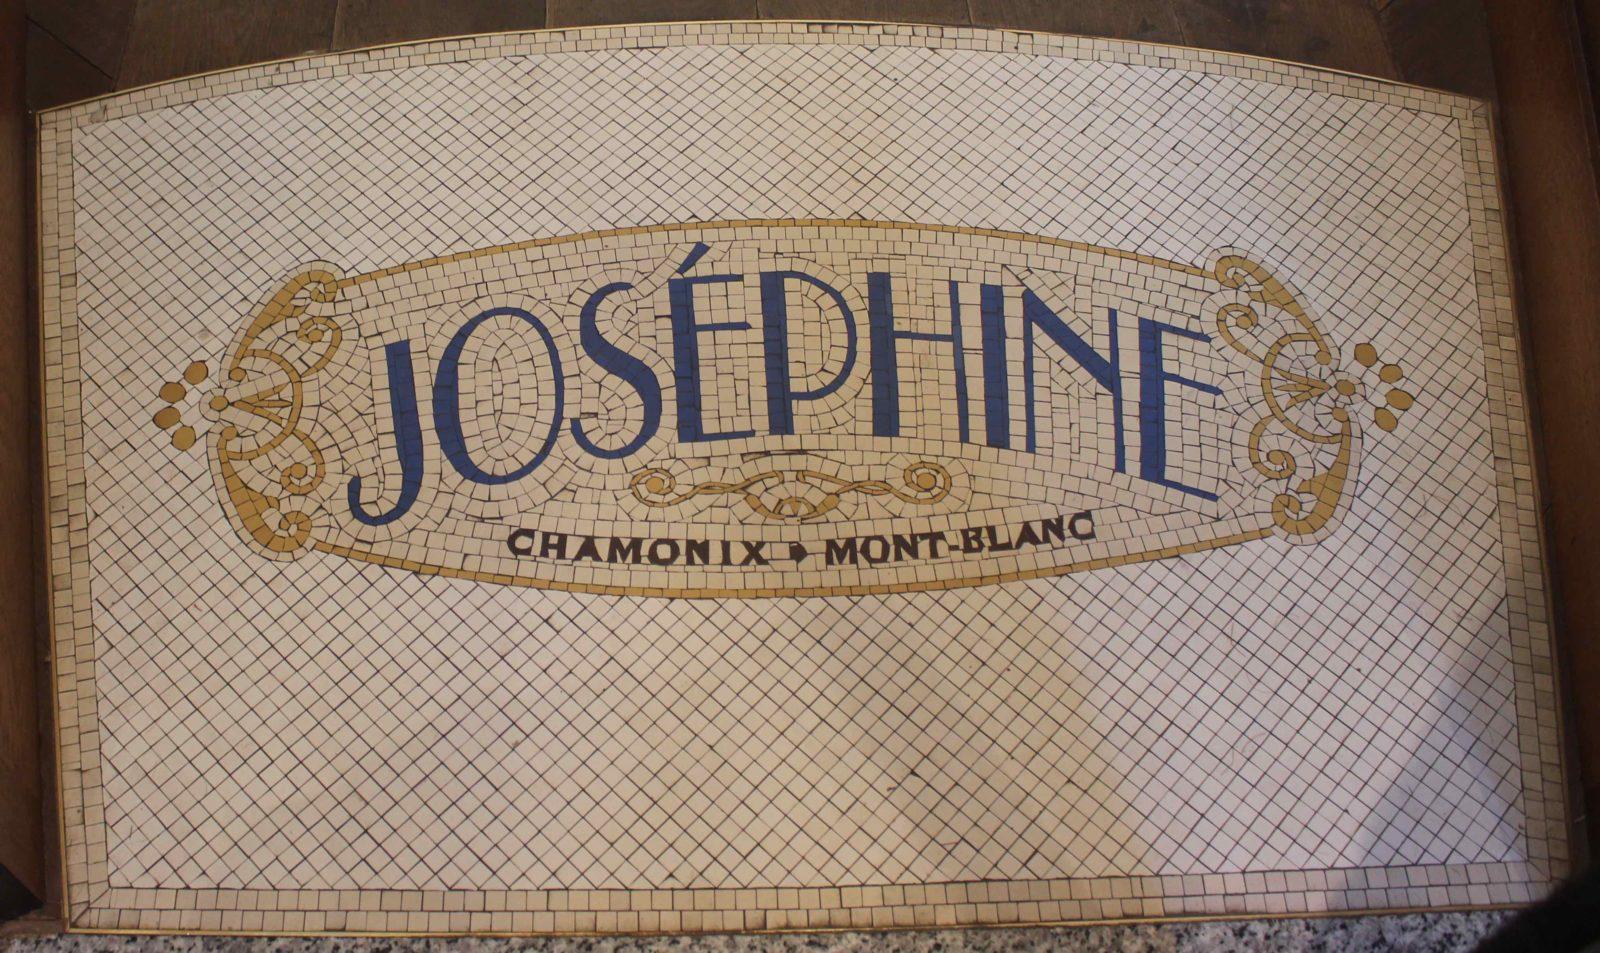 Chamonix restaurant Joséphine